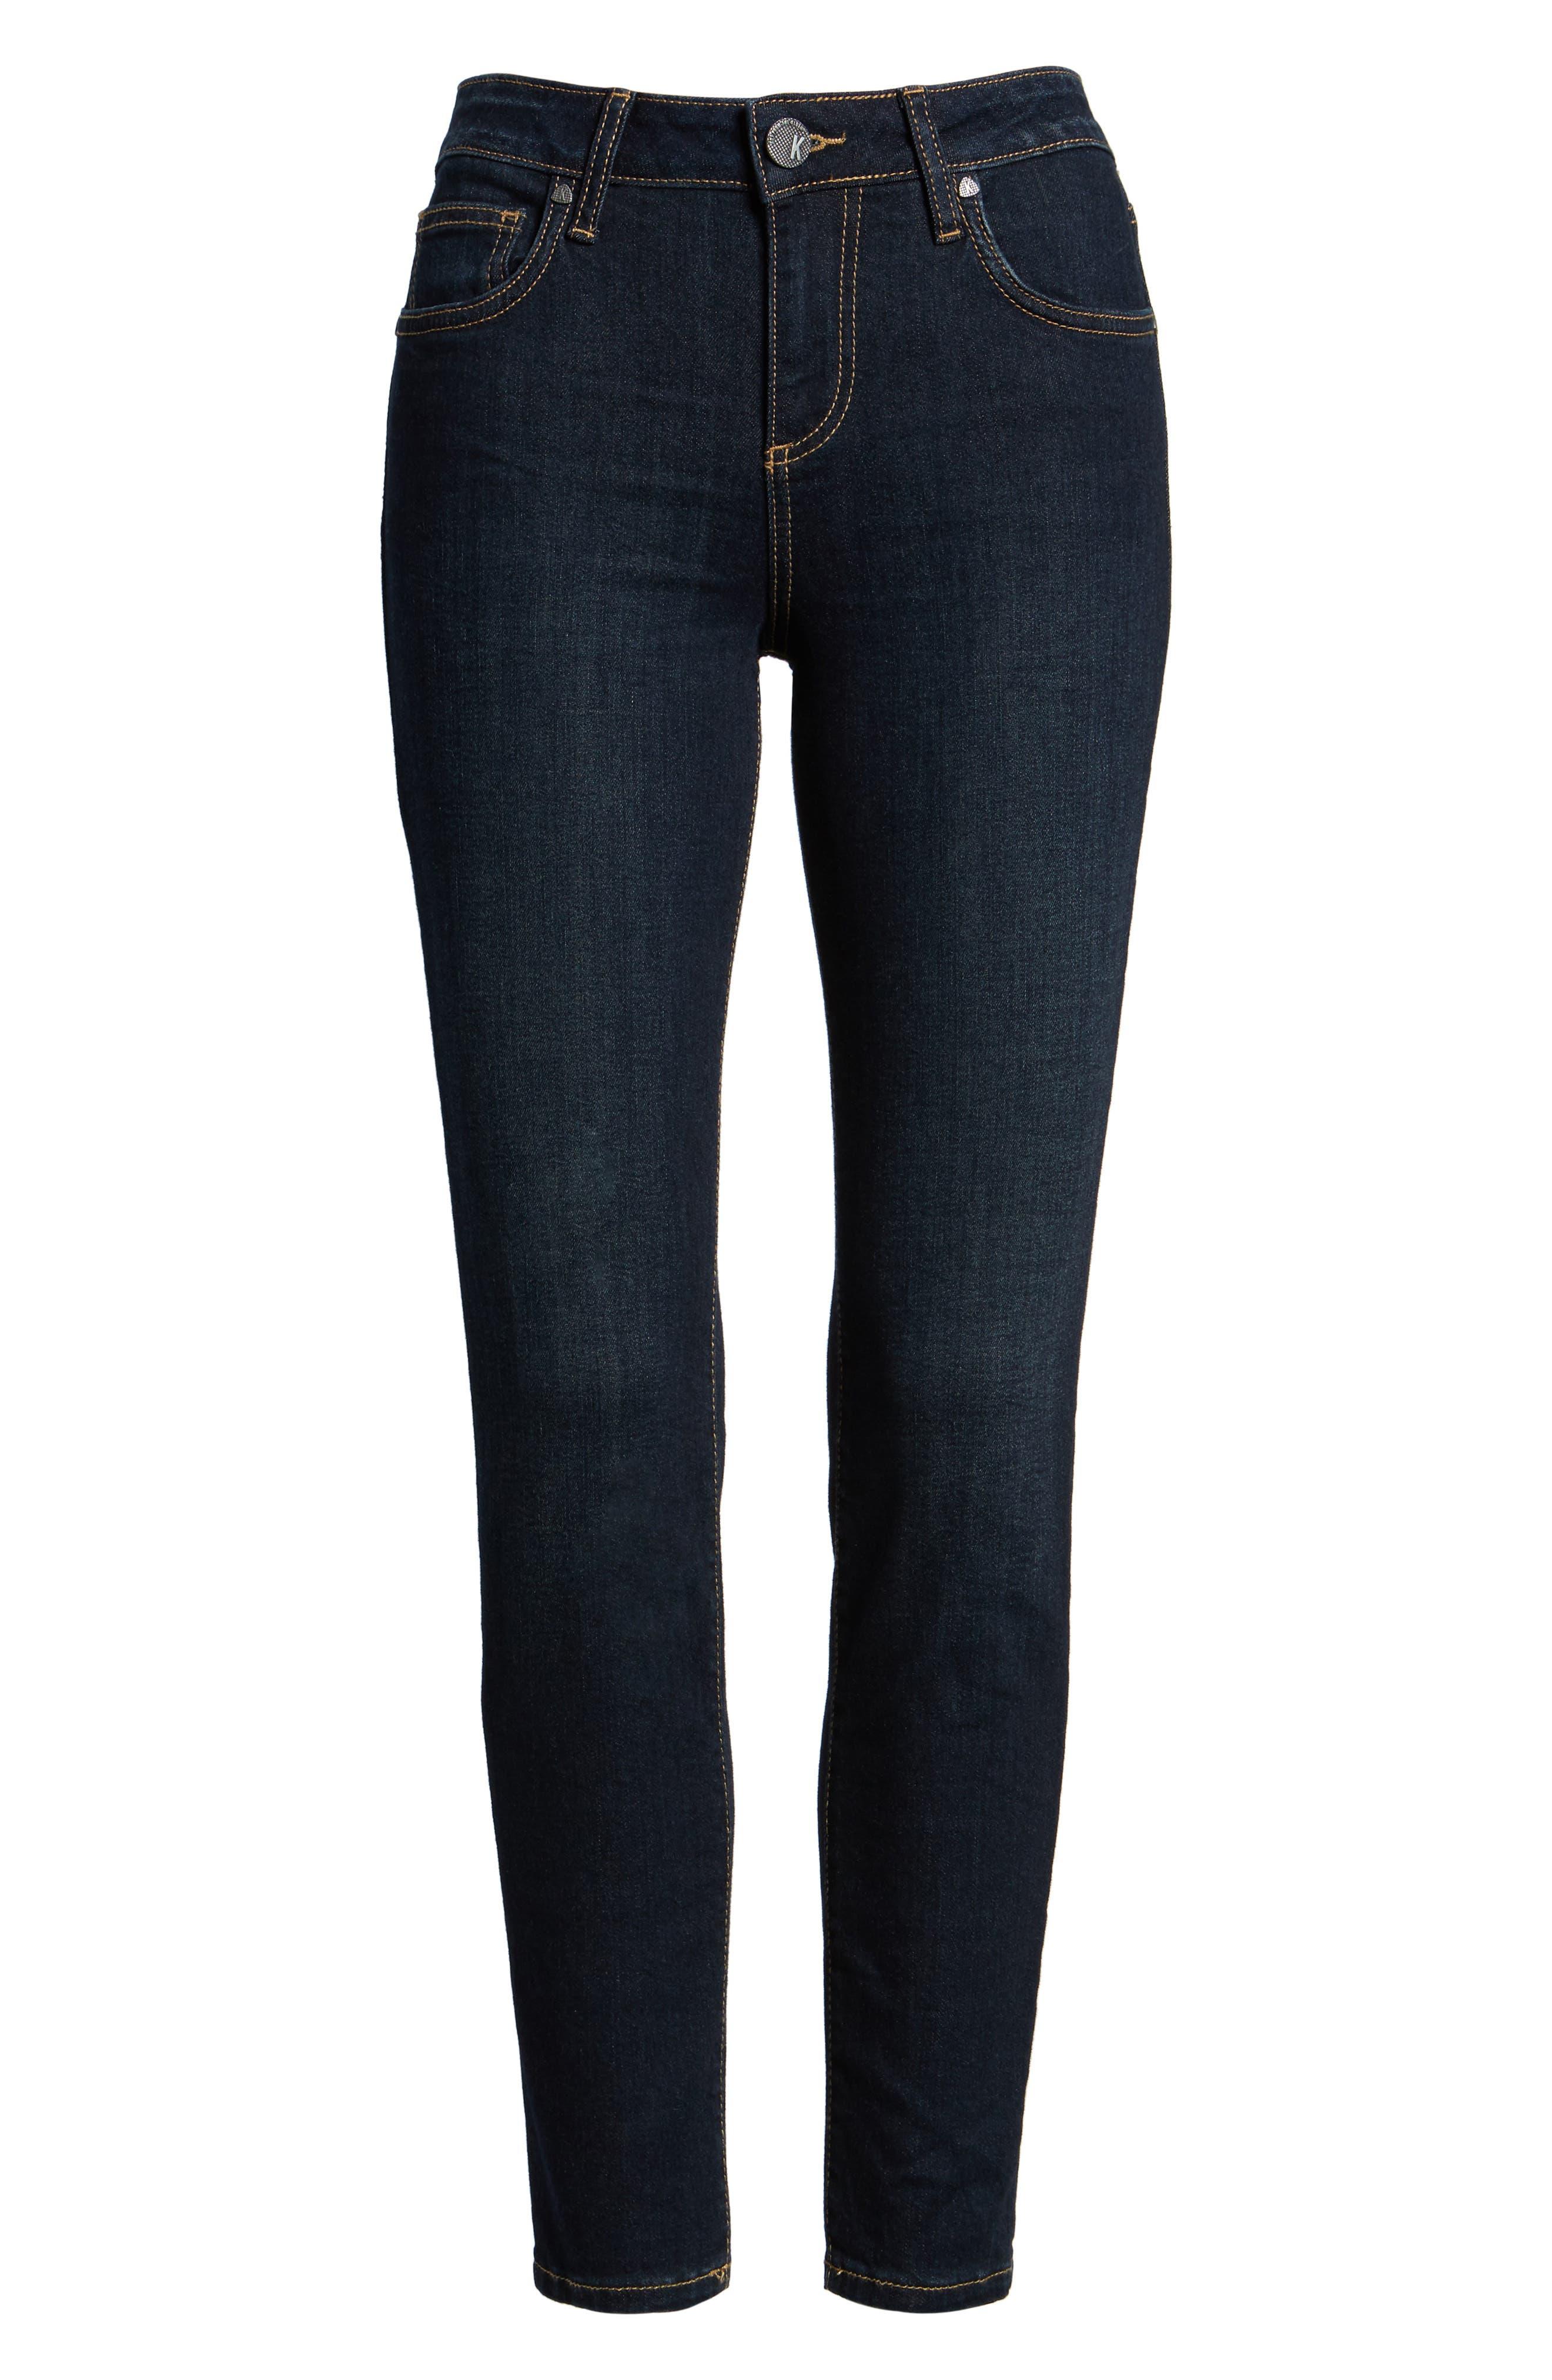 Diana Kurvy Stretch Ankle Jeans,                             Alternate thumbnail 6, color,                             490